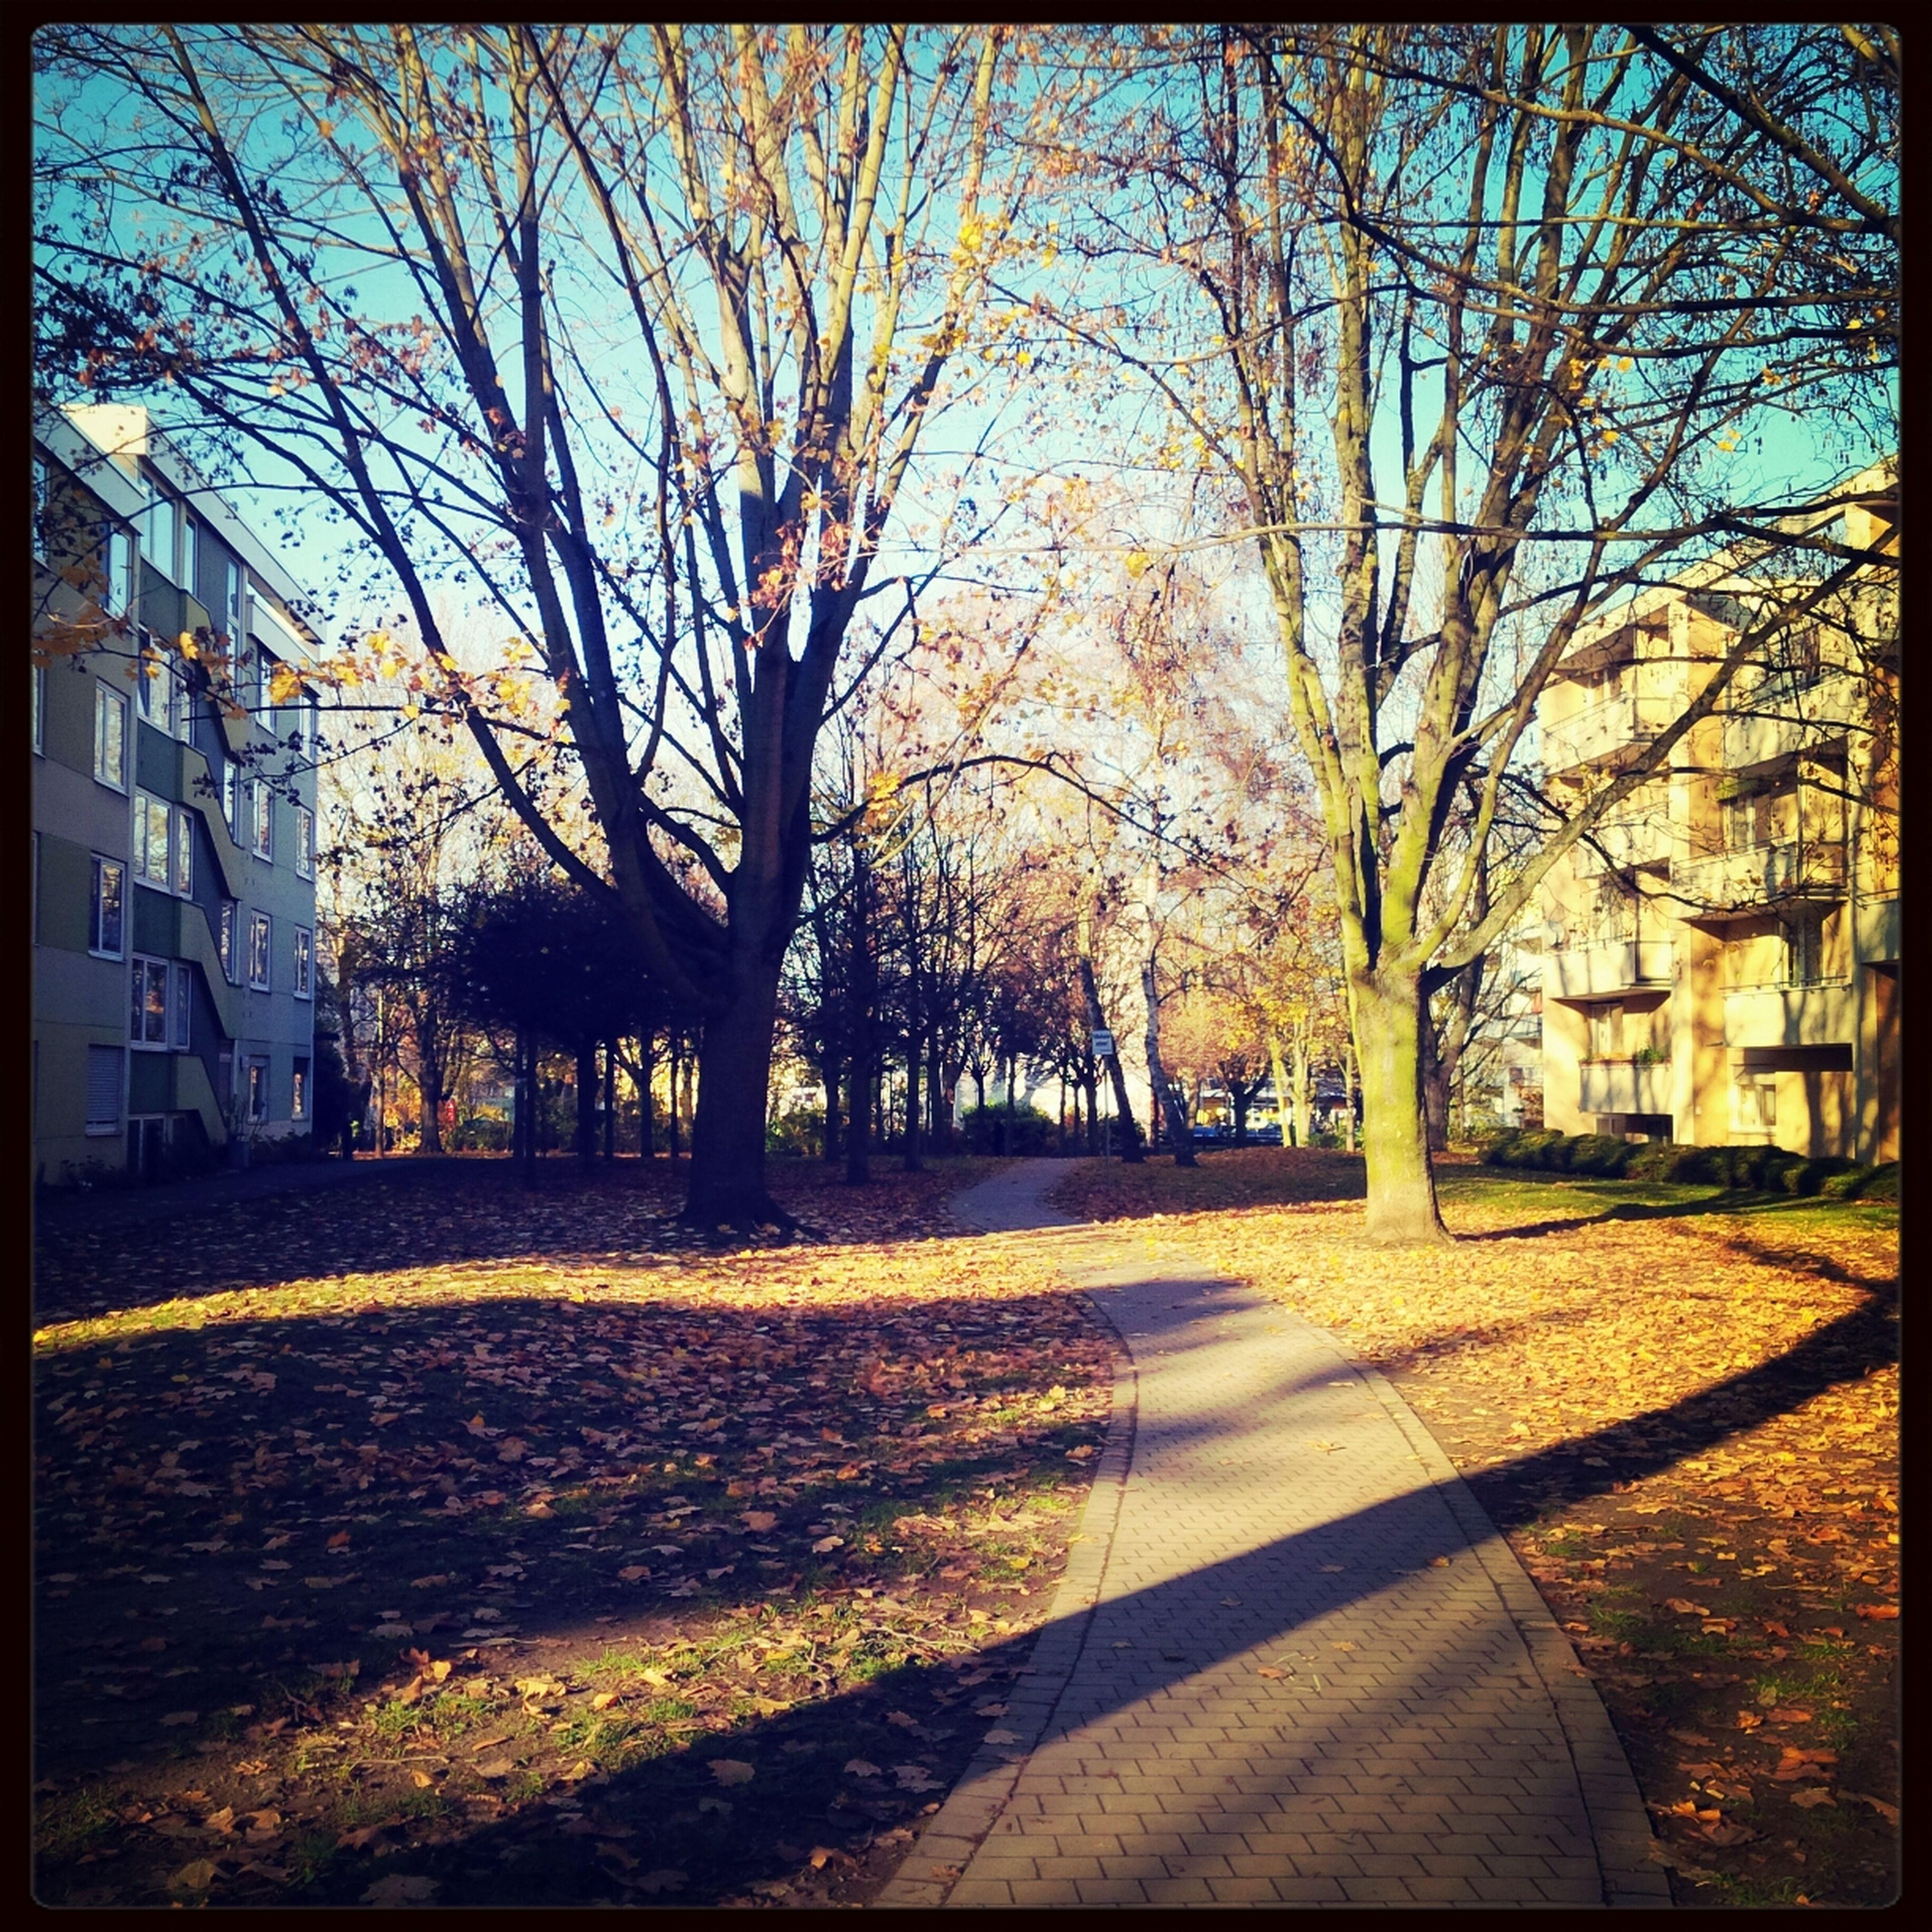 Autumn November On My Way Home